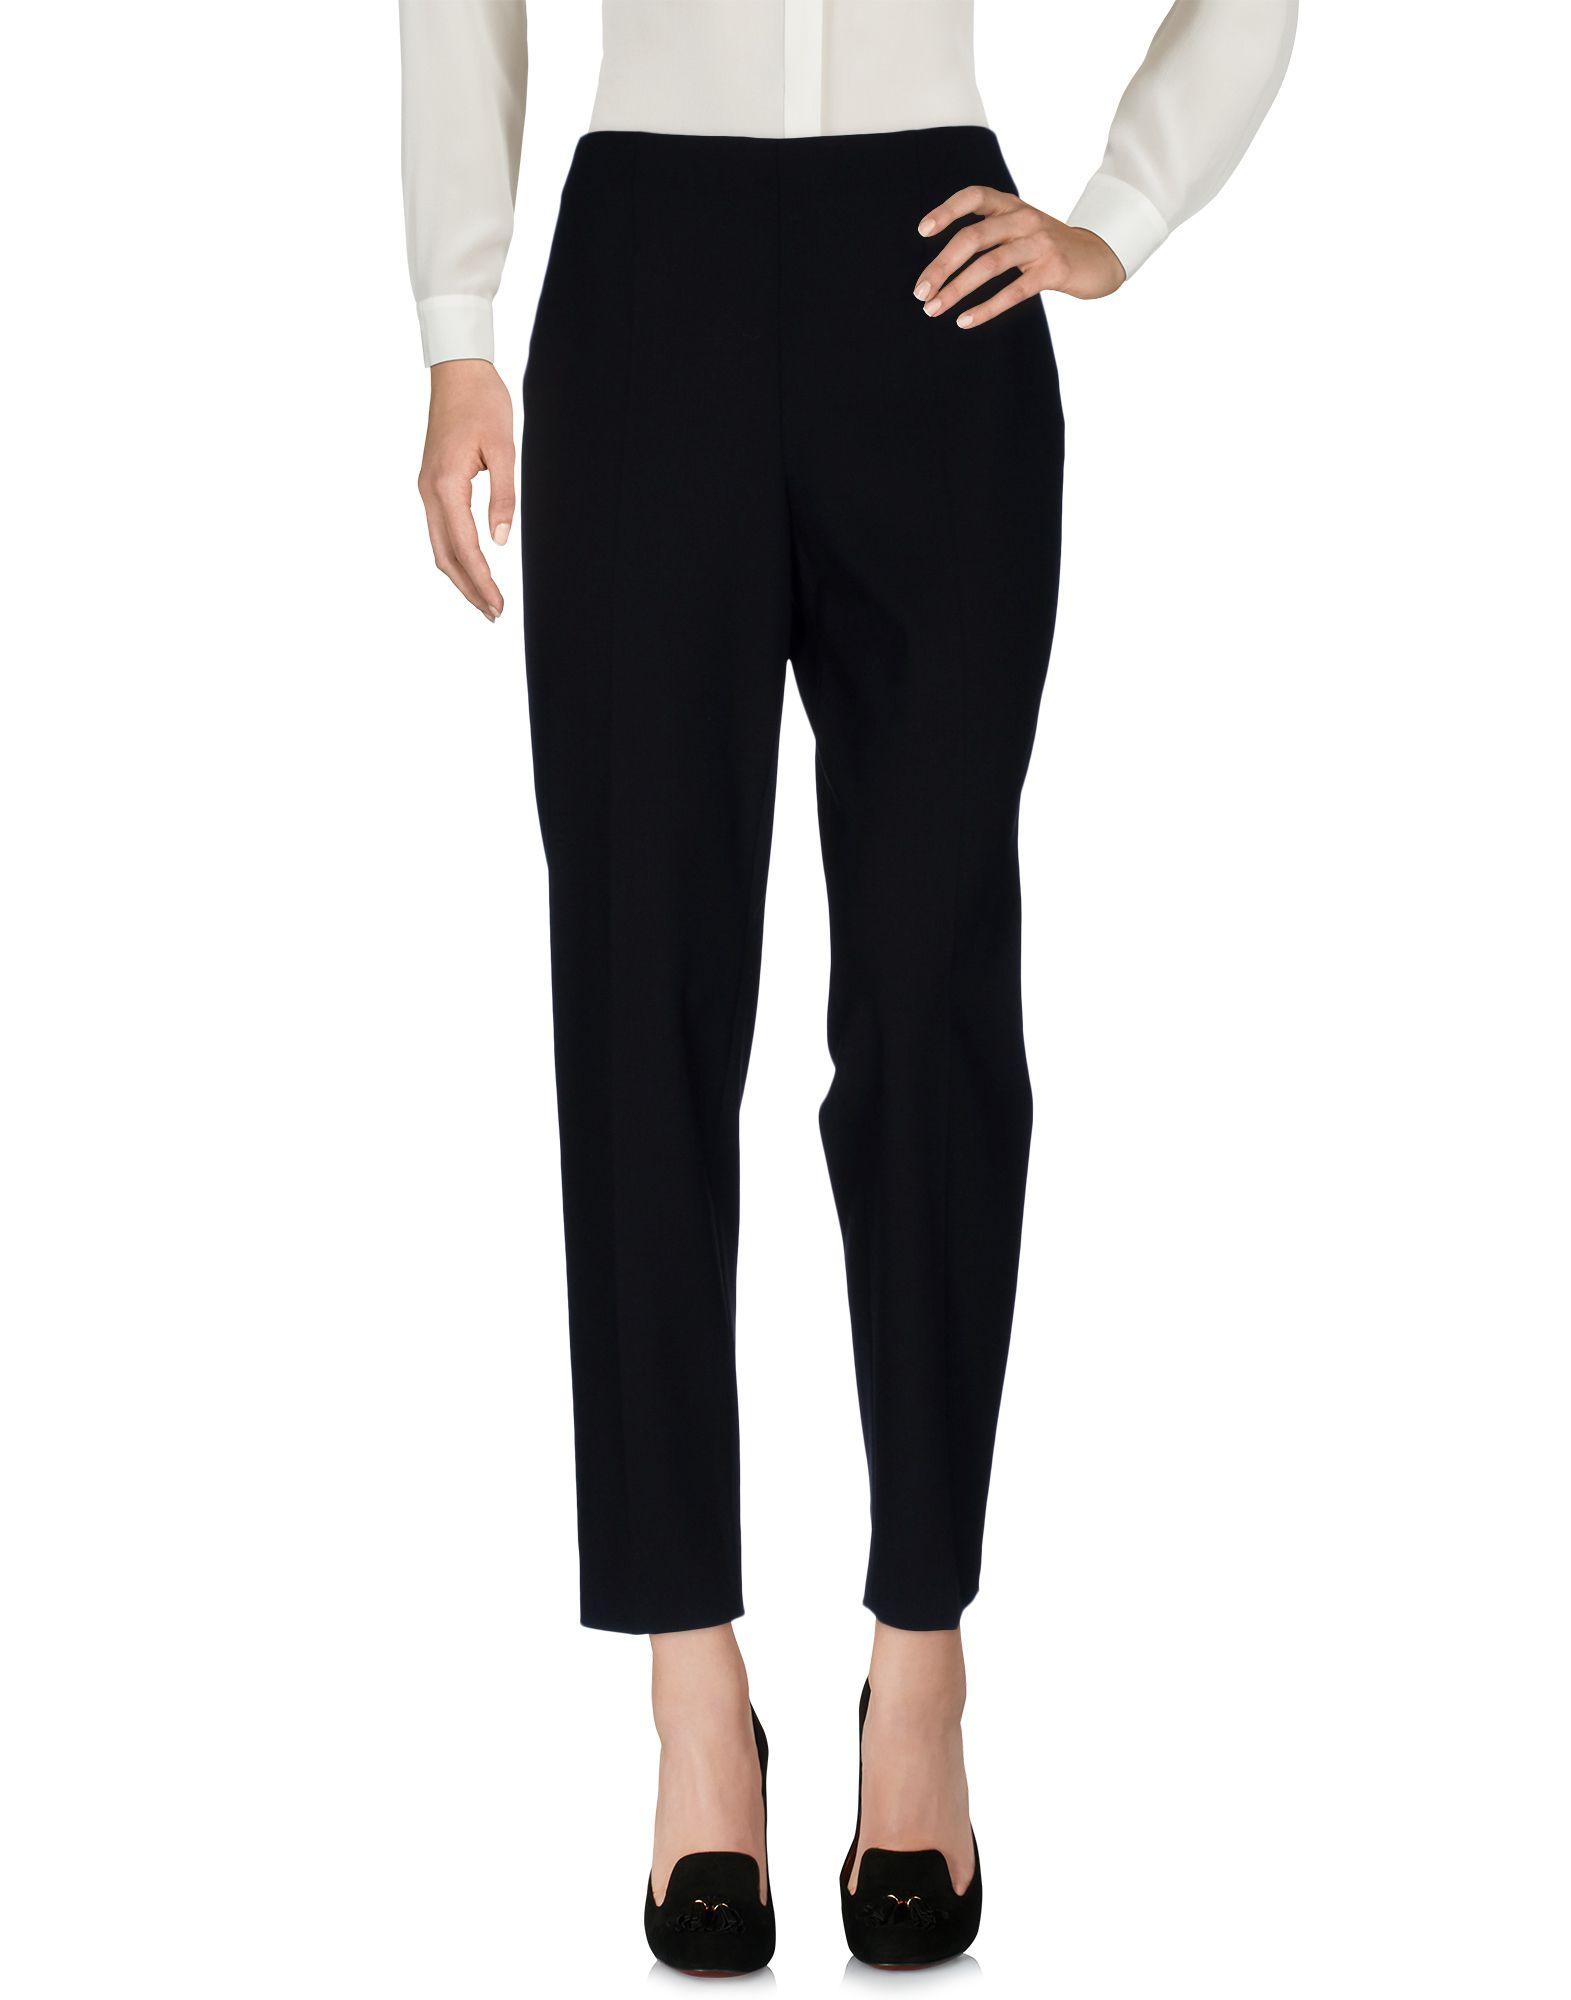 Pantalone Piazza Sempione Donna - Acquista online su L6wM9gHKNj